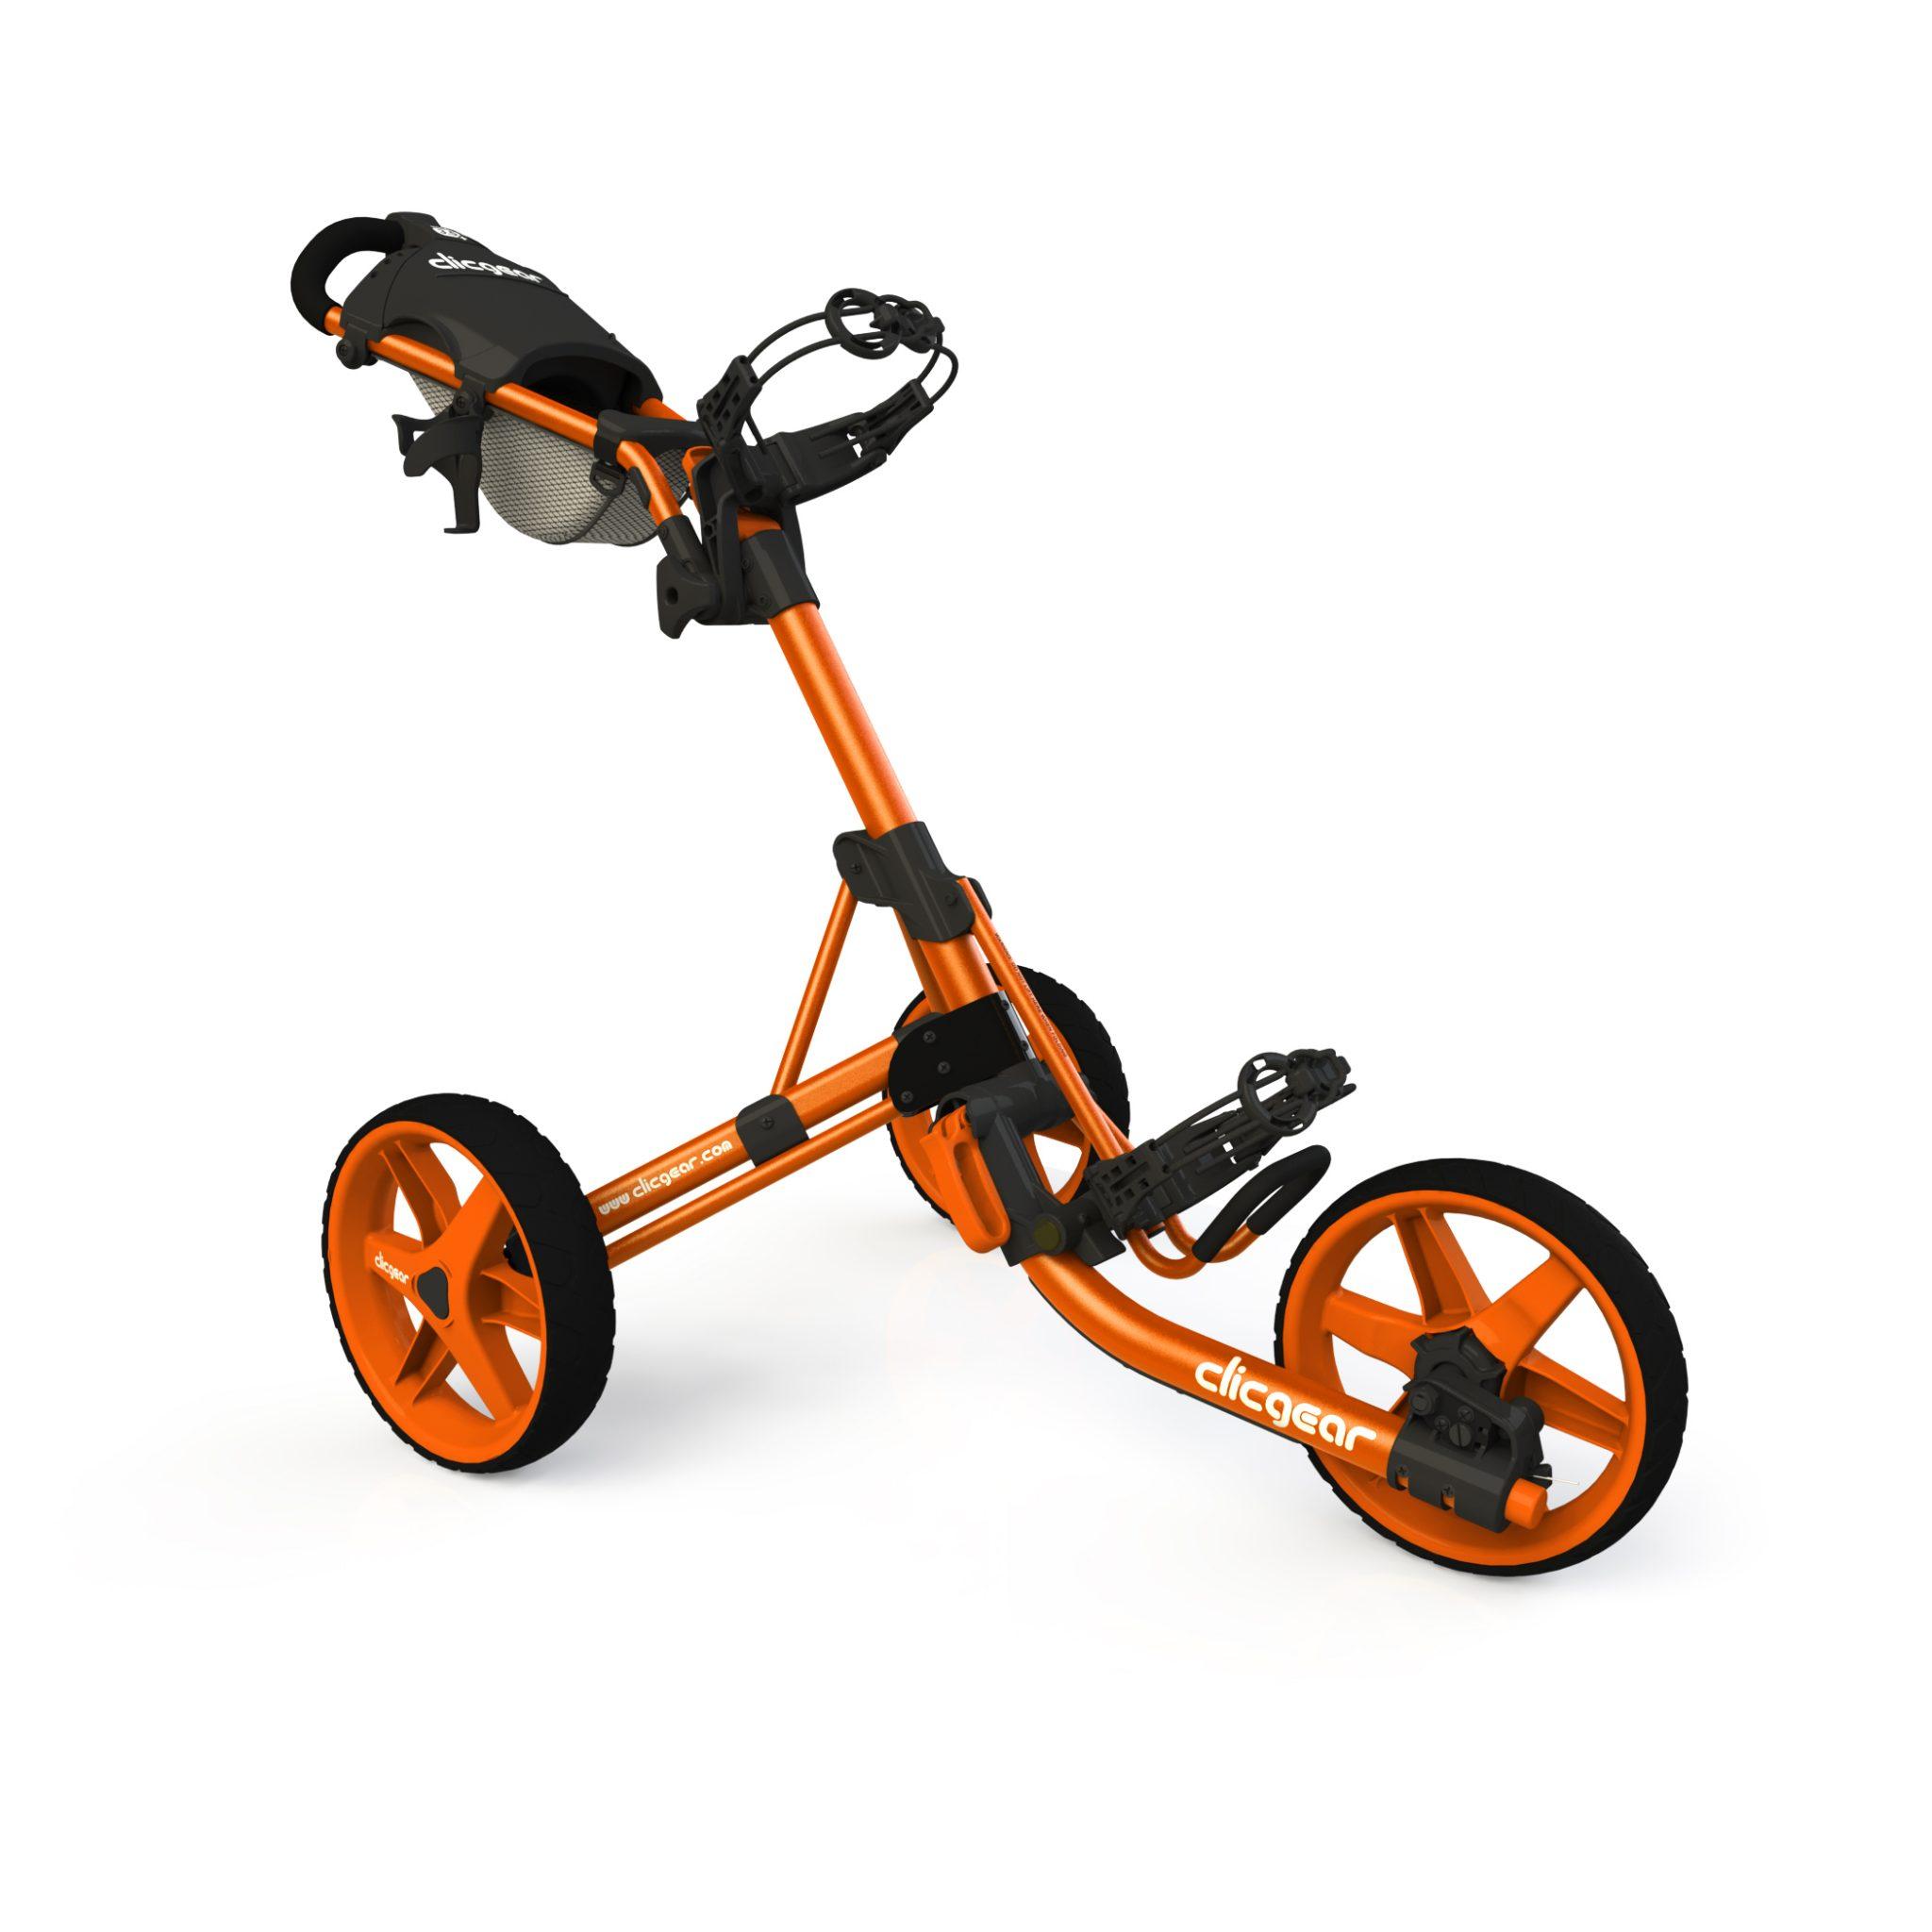 Golftrolleys van Clicgear